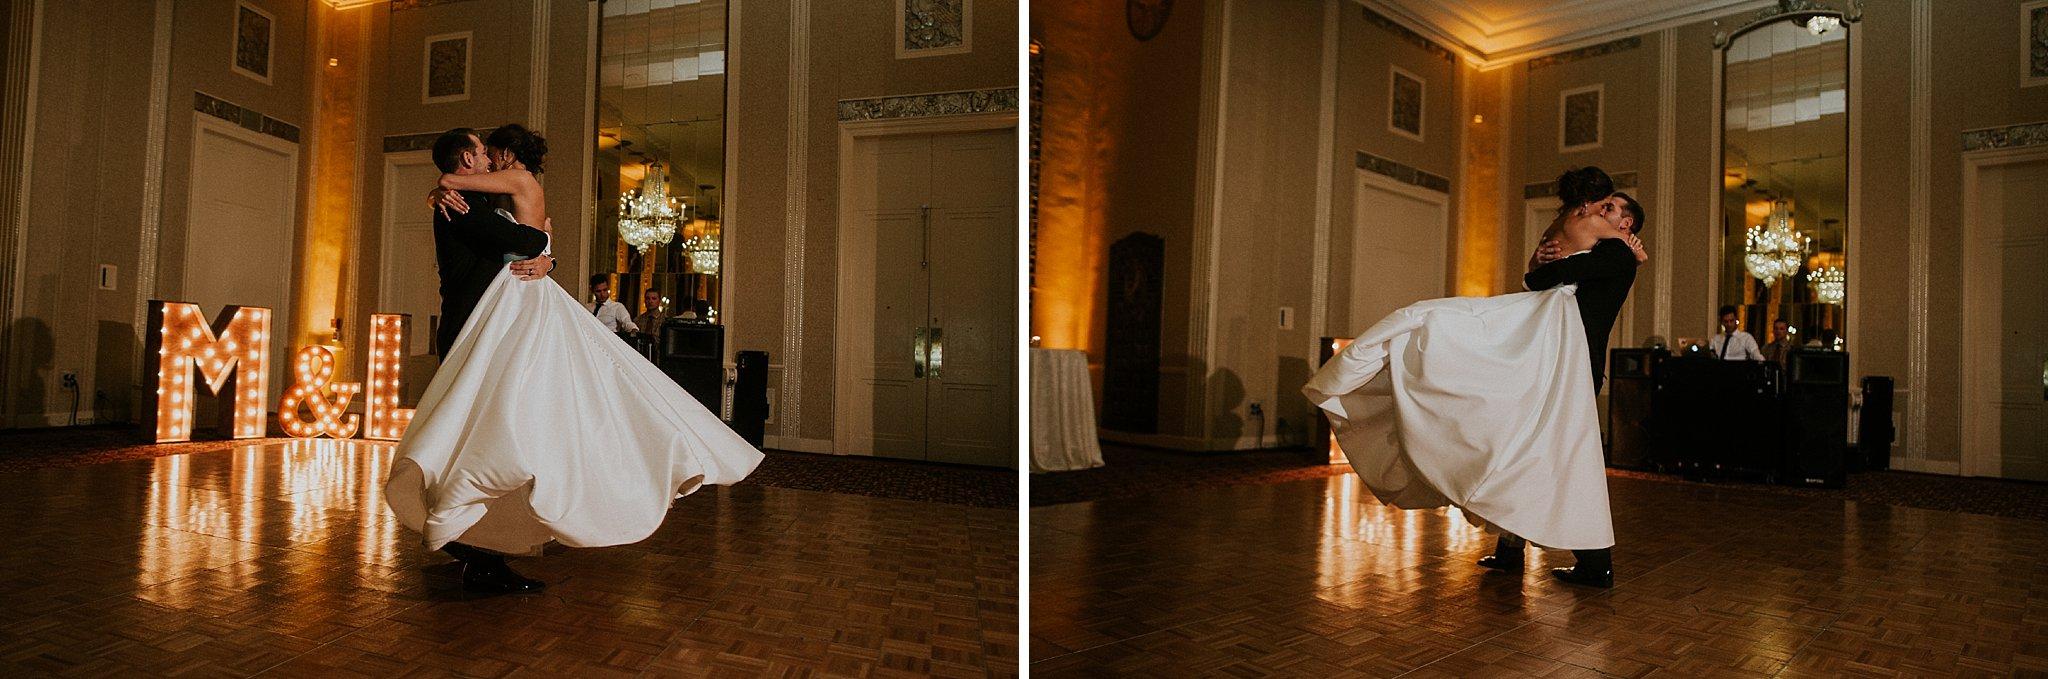 Matt-Lauren_St-Marys_Hilton-City-Center-Milwaukee-Wedding_liller-photo_0089.jpg